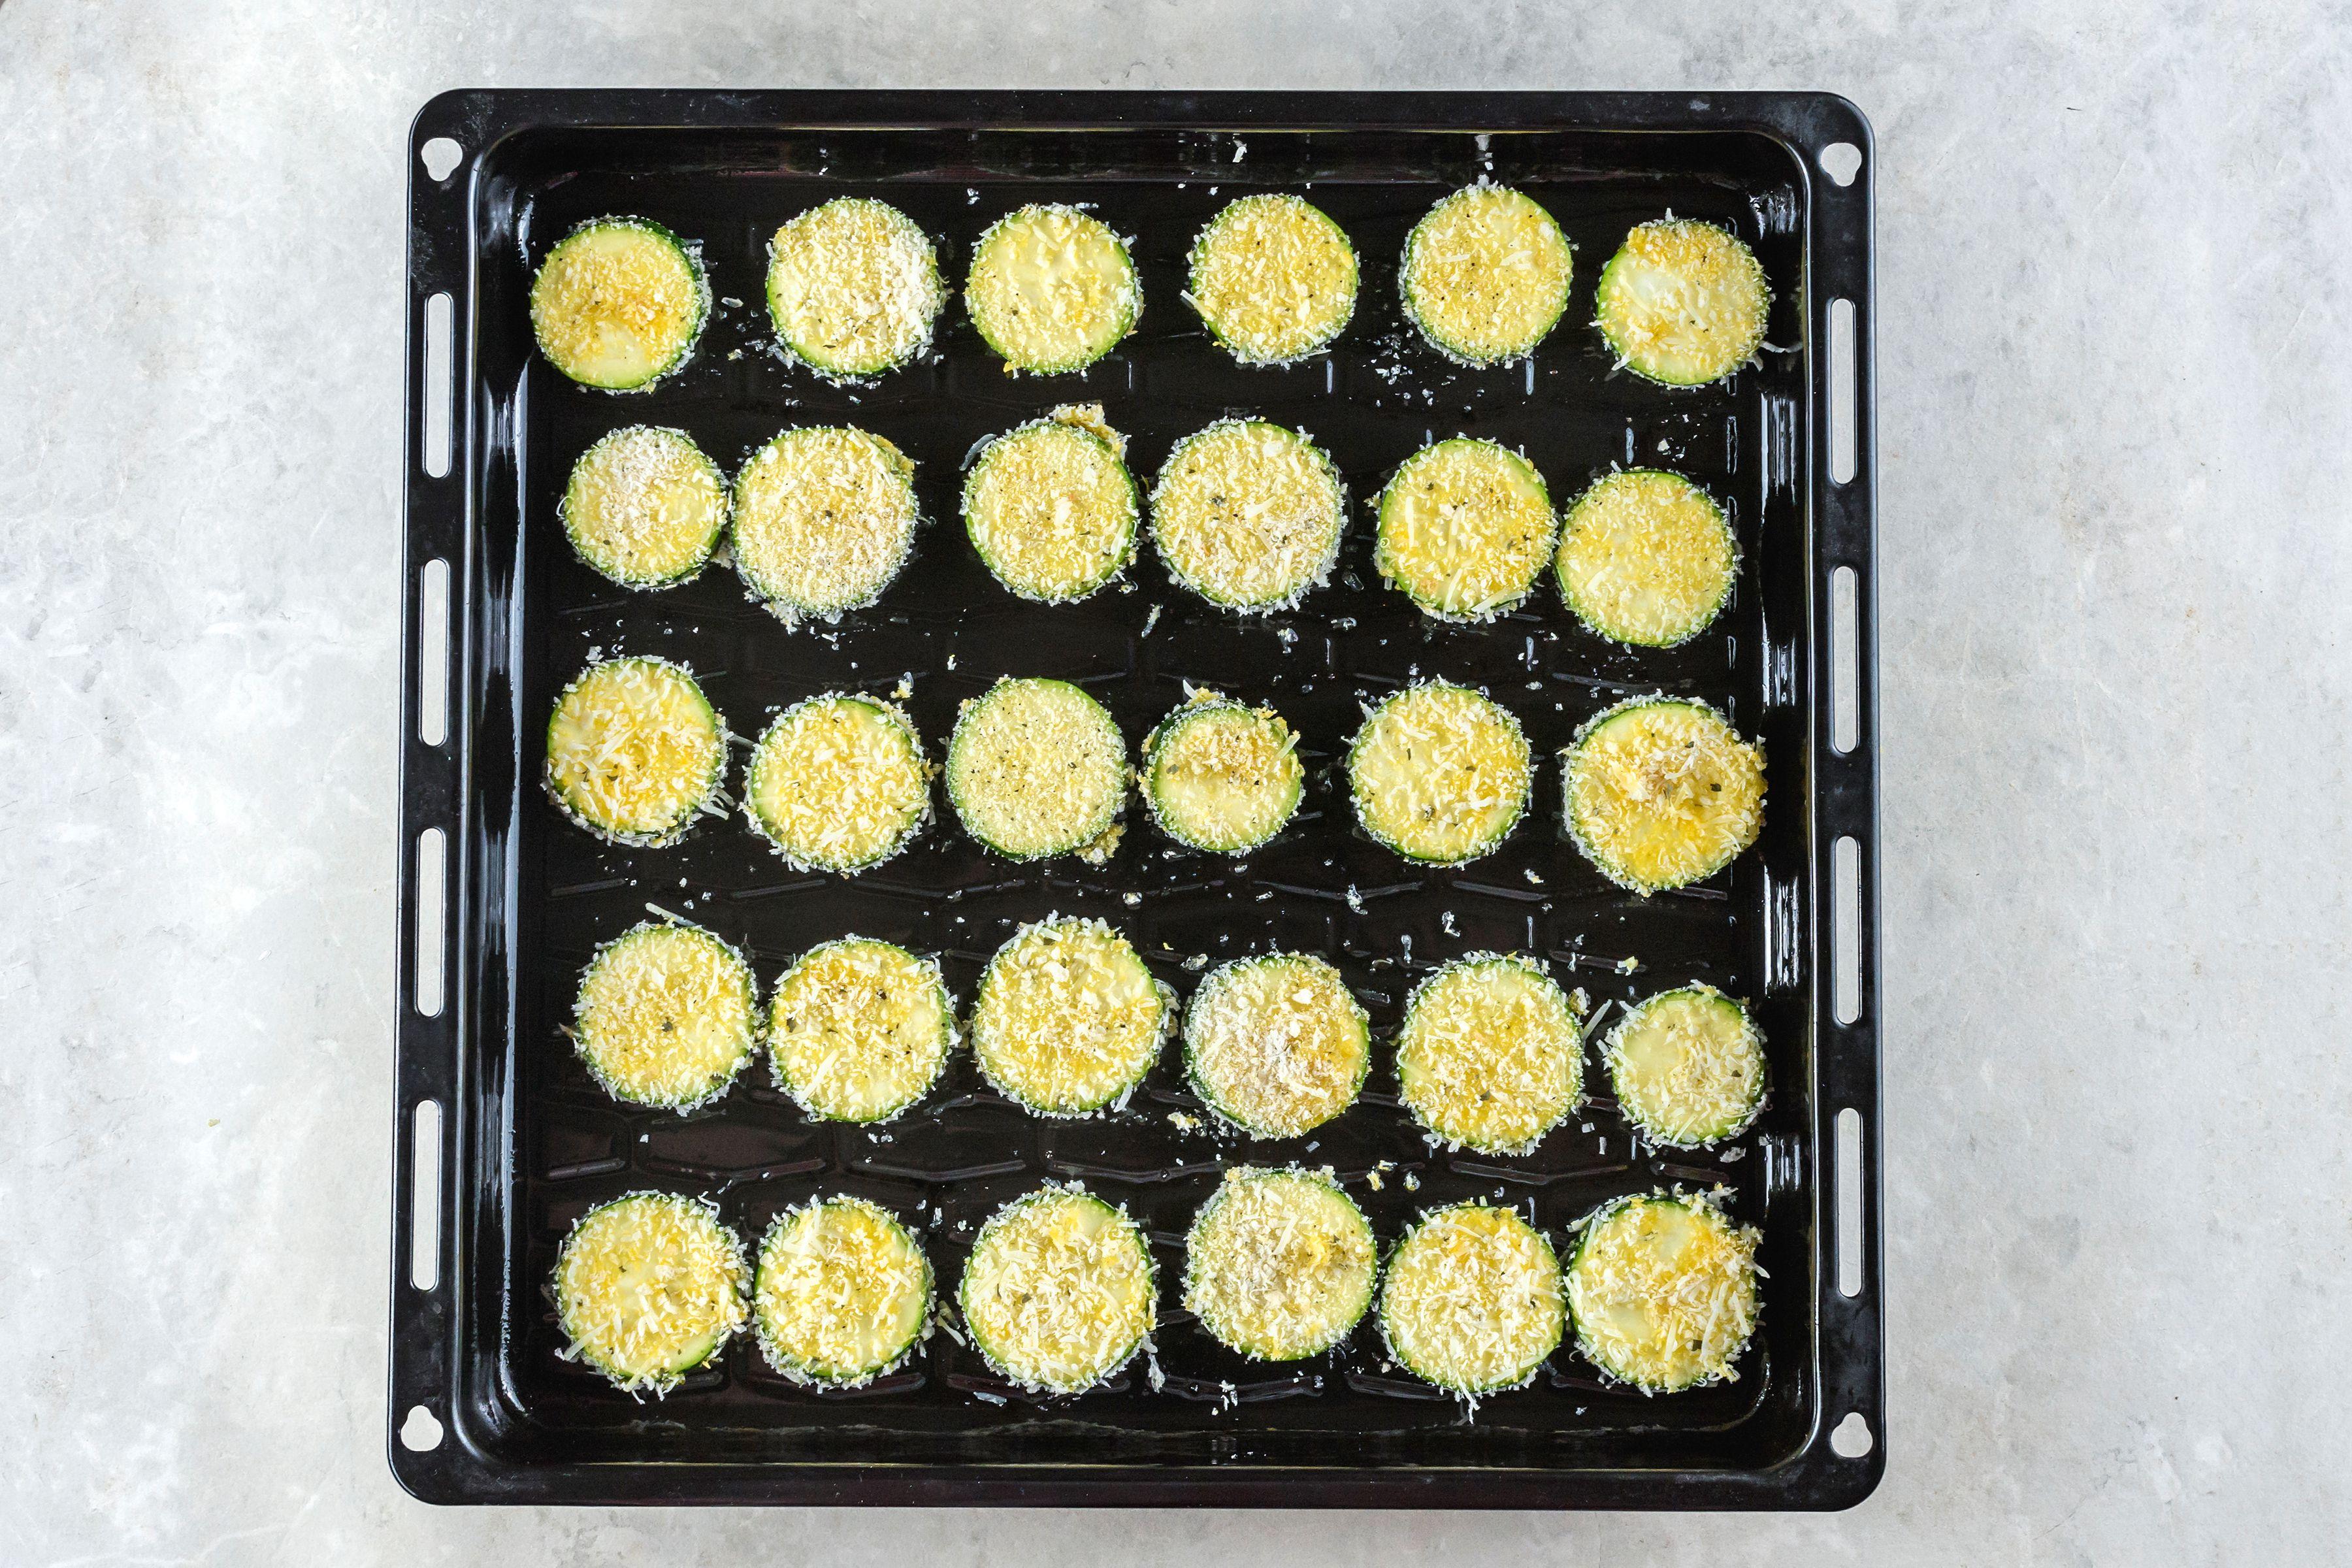 Zucchini on a baking sheet